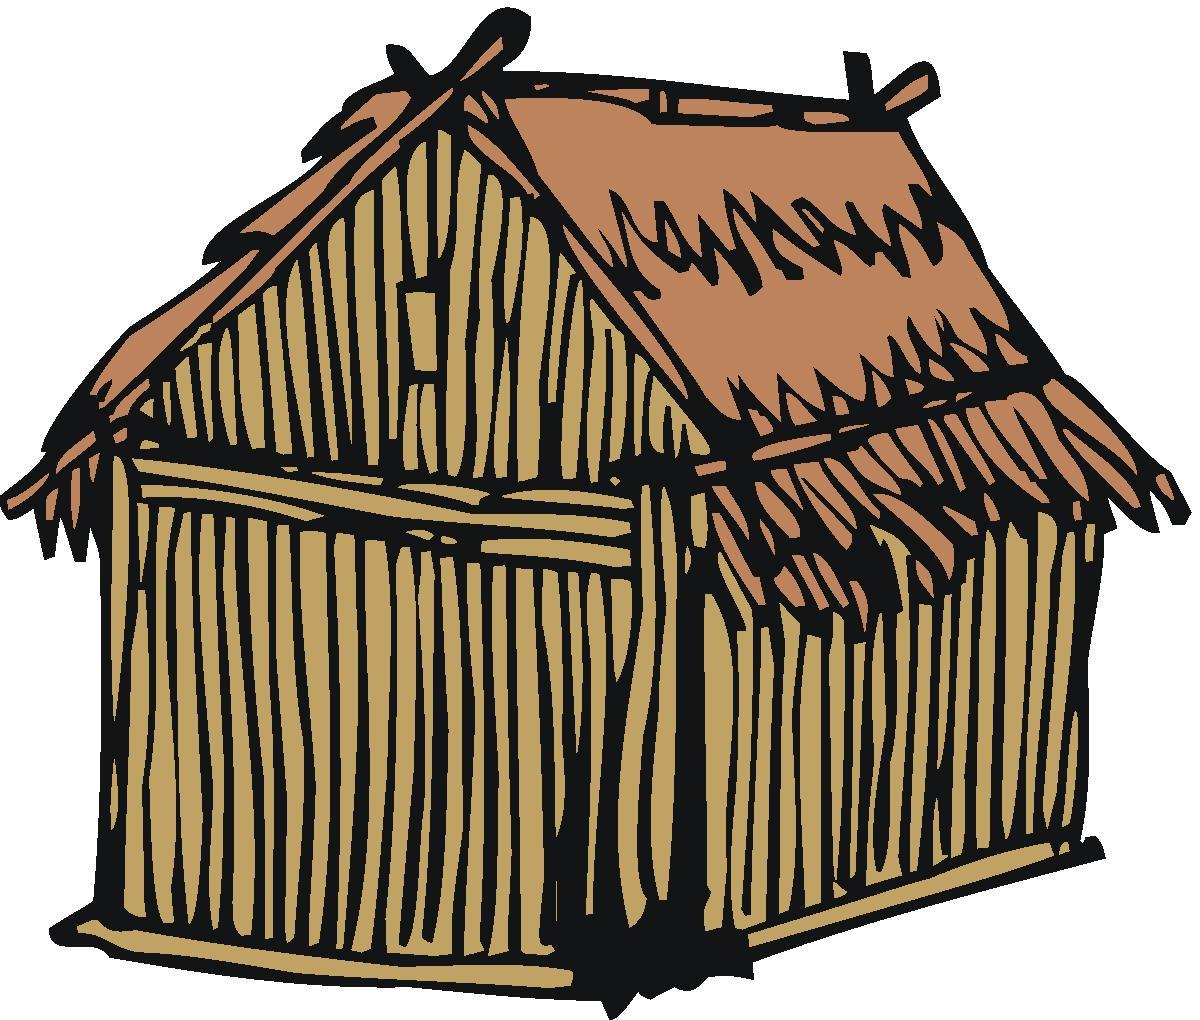 Hut clipart Download Hut Hut Clipart Clipart